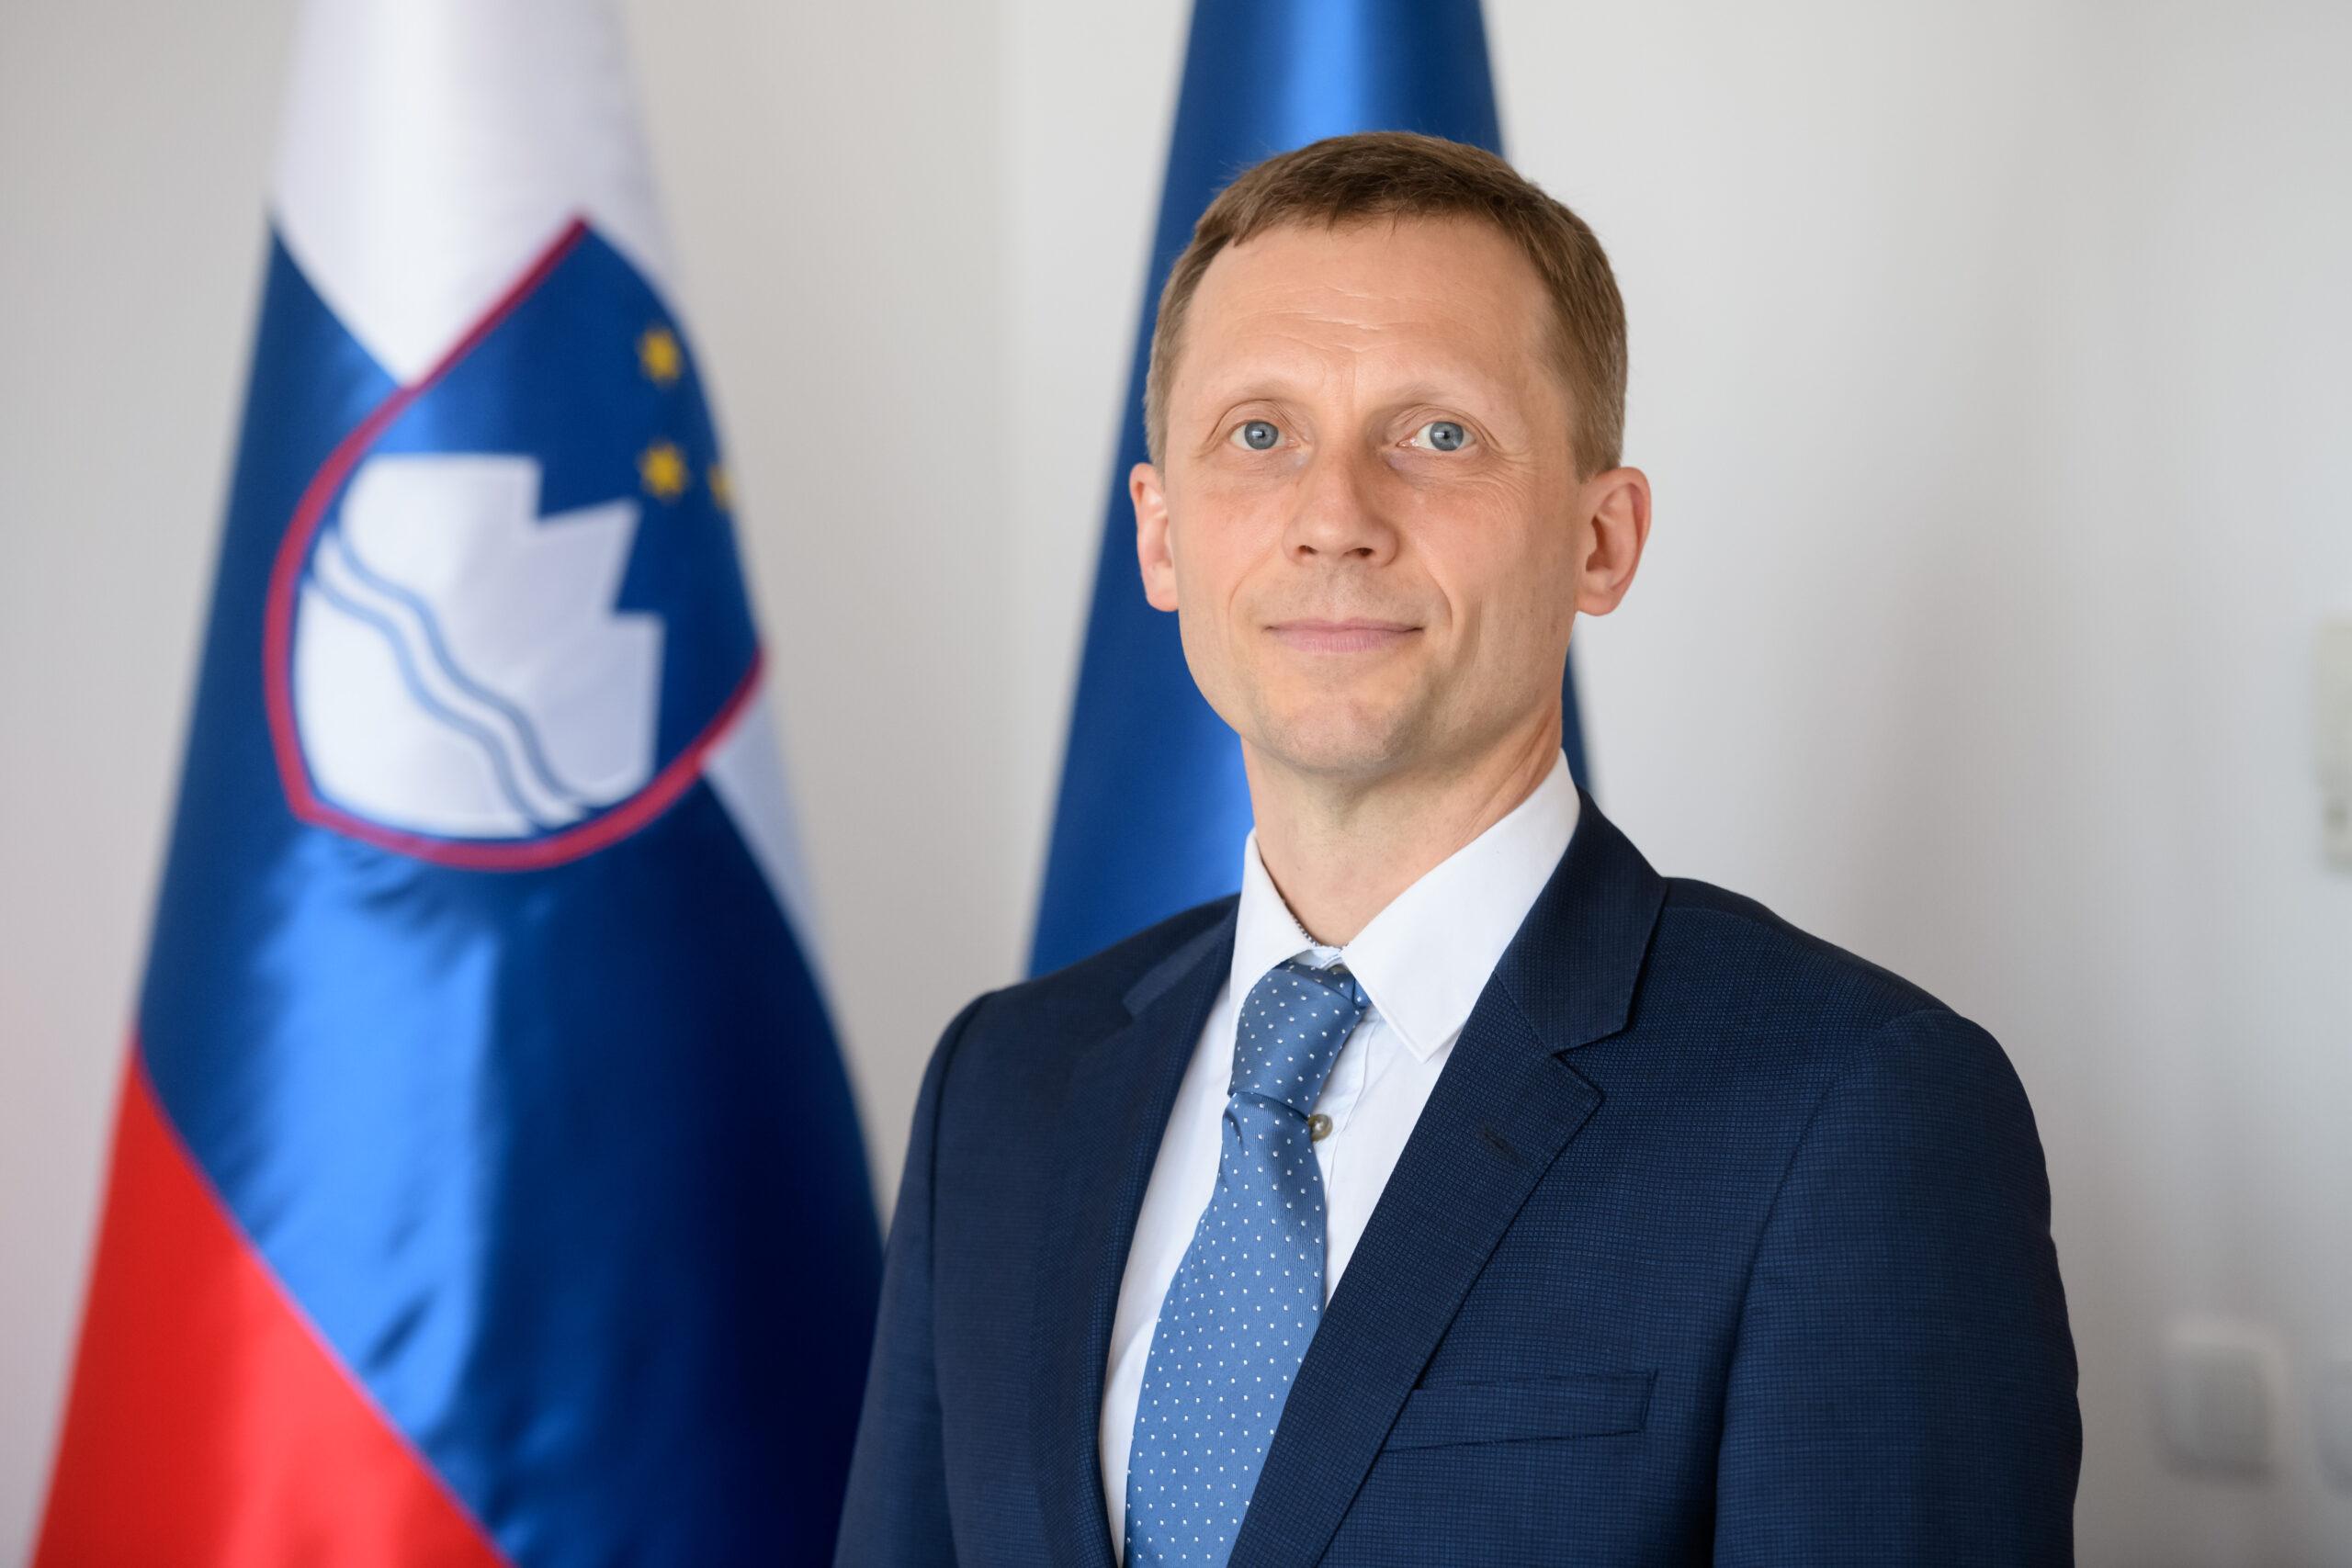 Peter Geršak